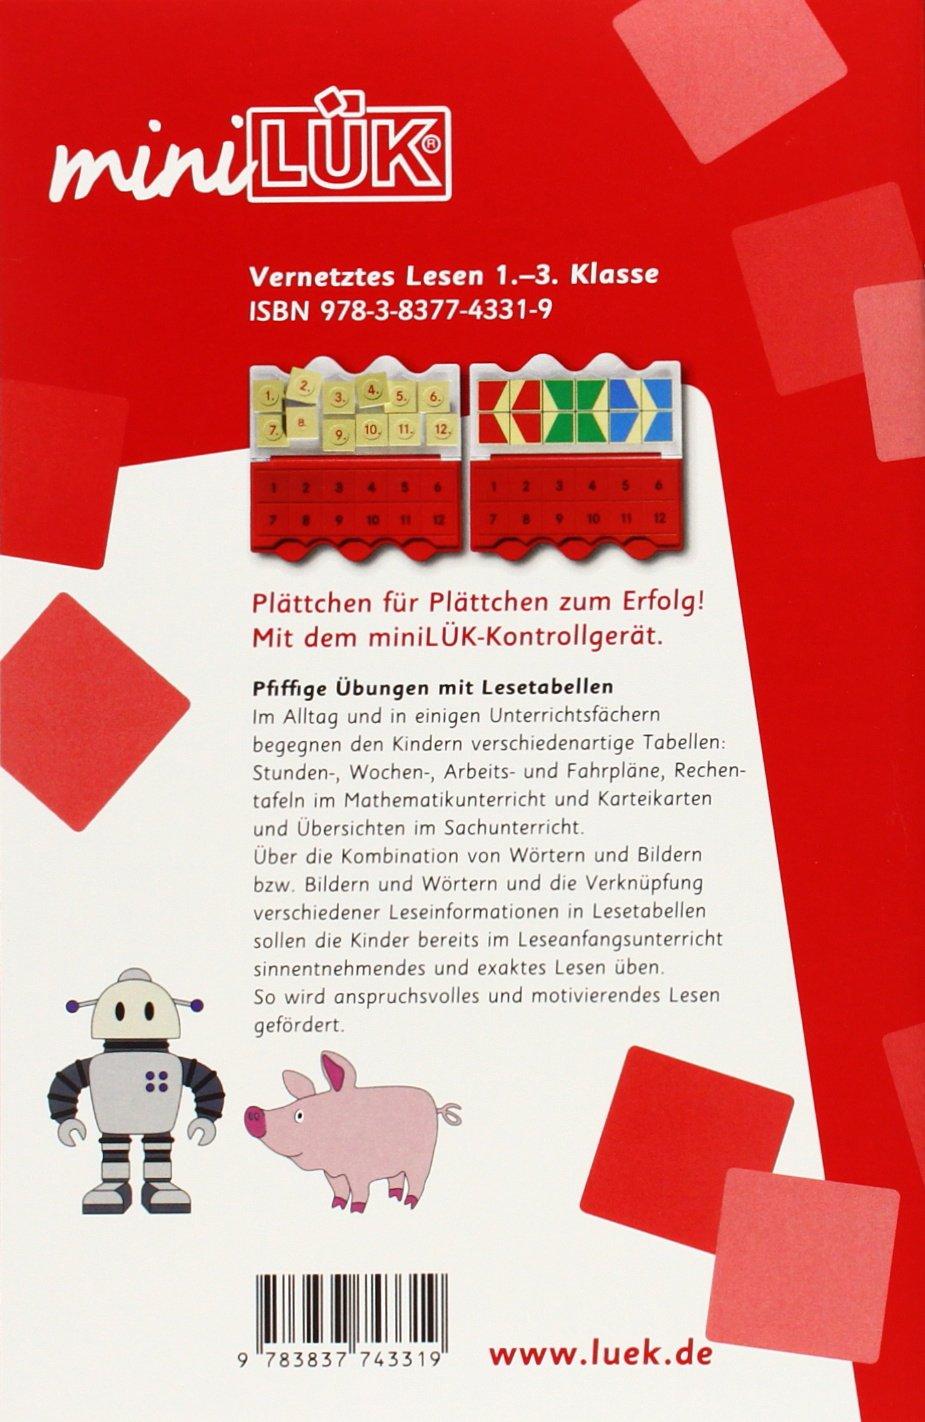 miniLÜK: Vernetztes Lesen: Pfiffige Übungen mit Lesetabellen: Amazon ...